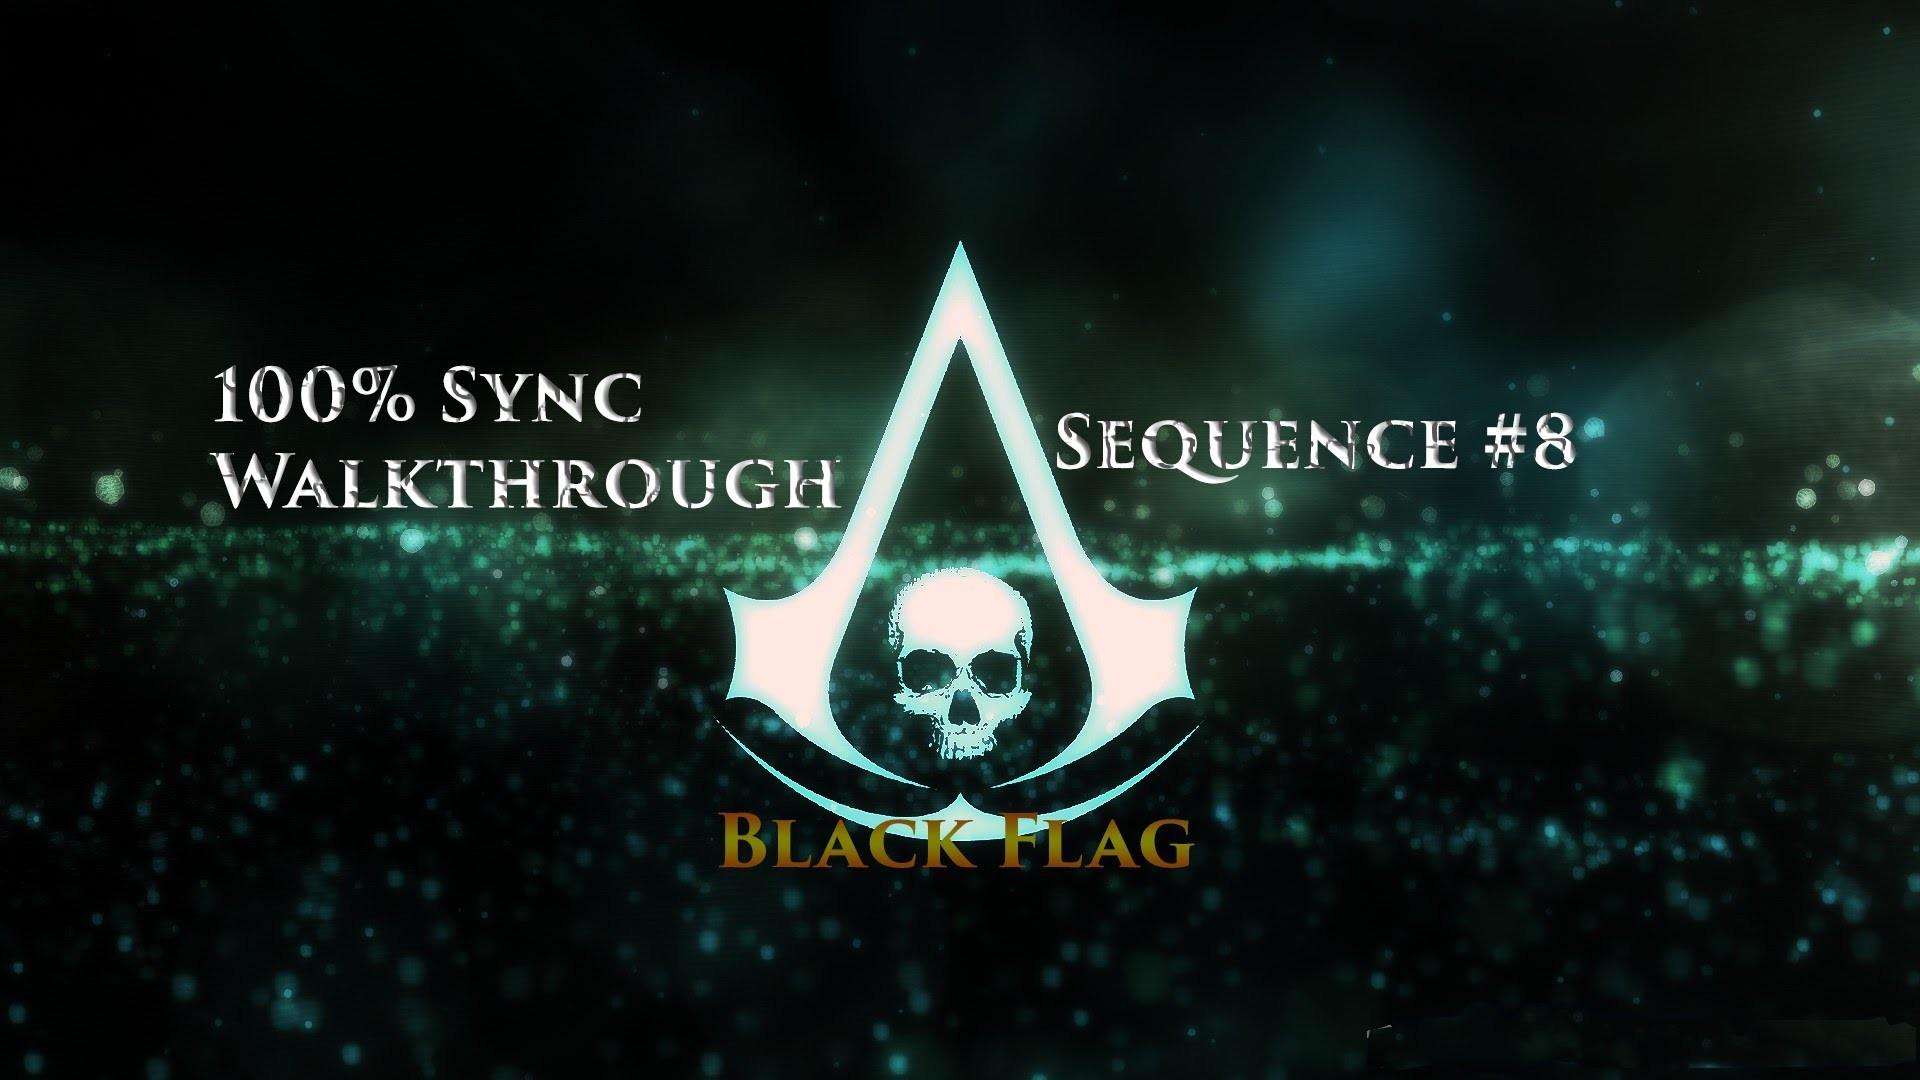 Assassin's Creed IV: Black Flag – 100% Sync Walkthrough – Sequence #8 –  YouTube